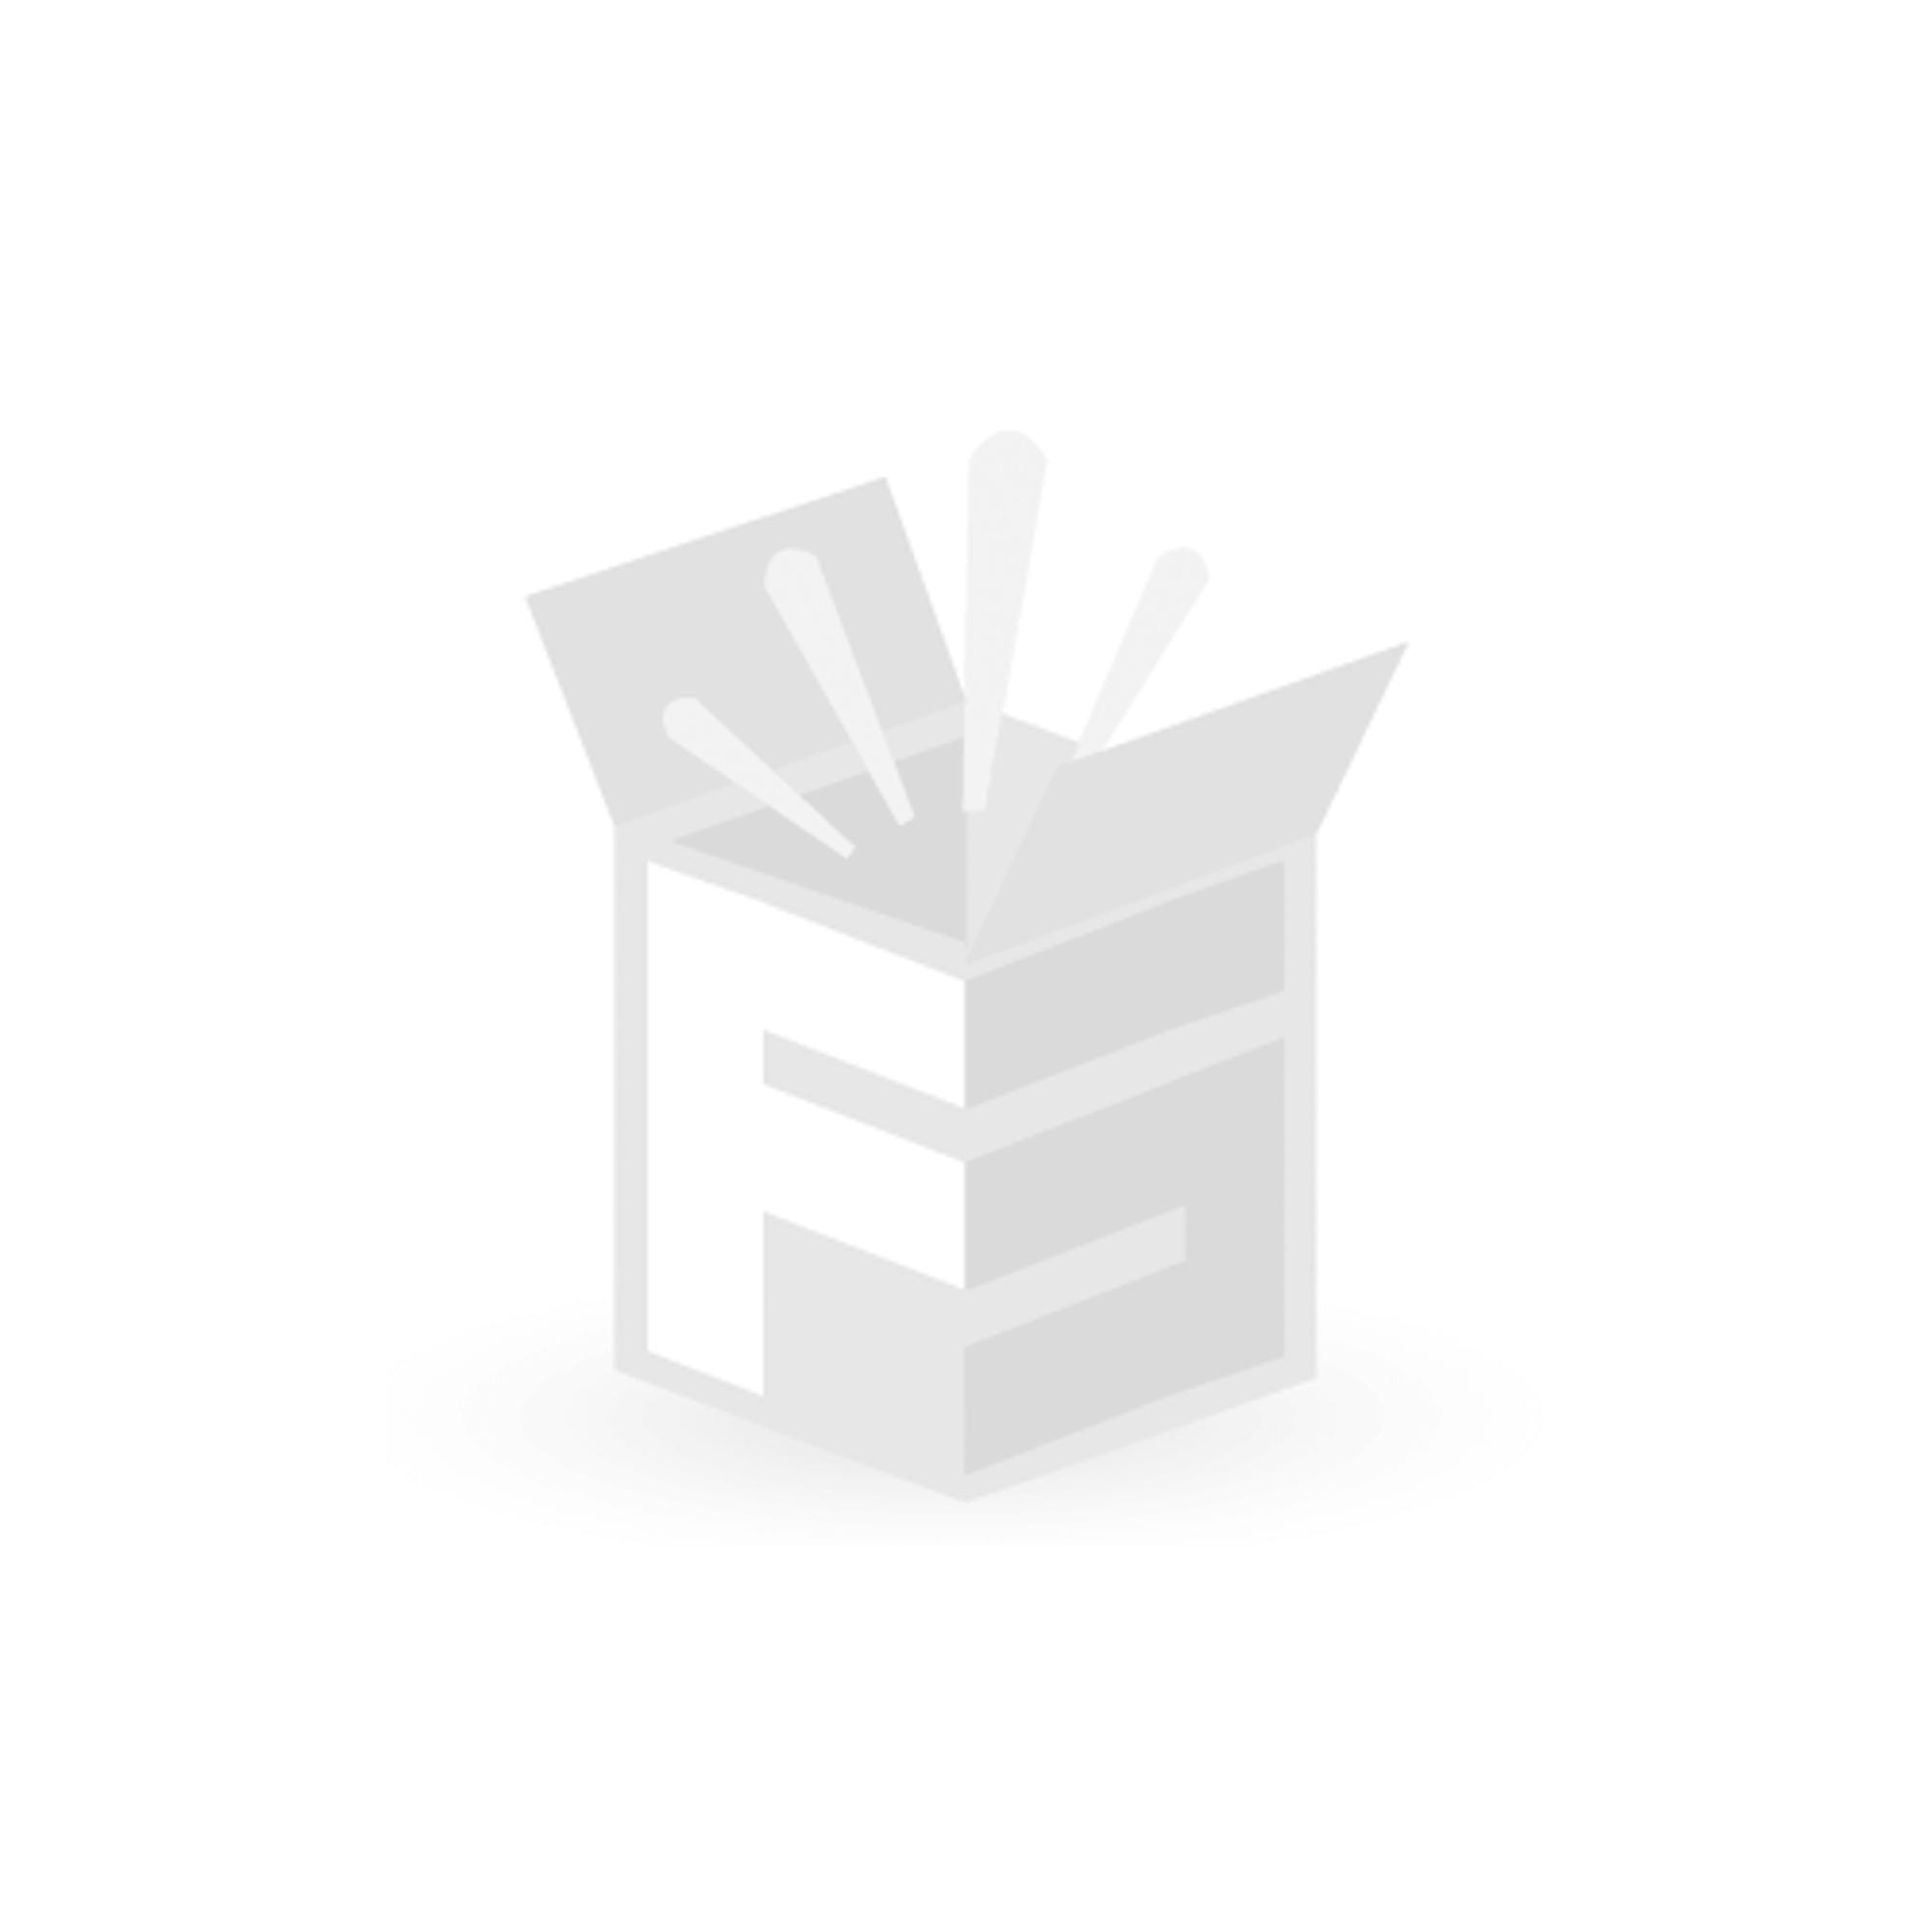 mit batterie perfect netgear arlo kabellose hd betrieb mit batterien oder akkus mglich with mit. Black Bedroom Furniture Sets. Home Design Ideas